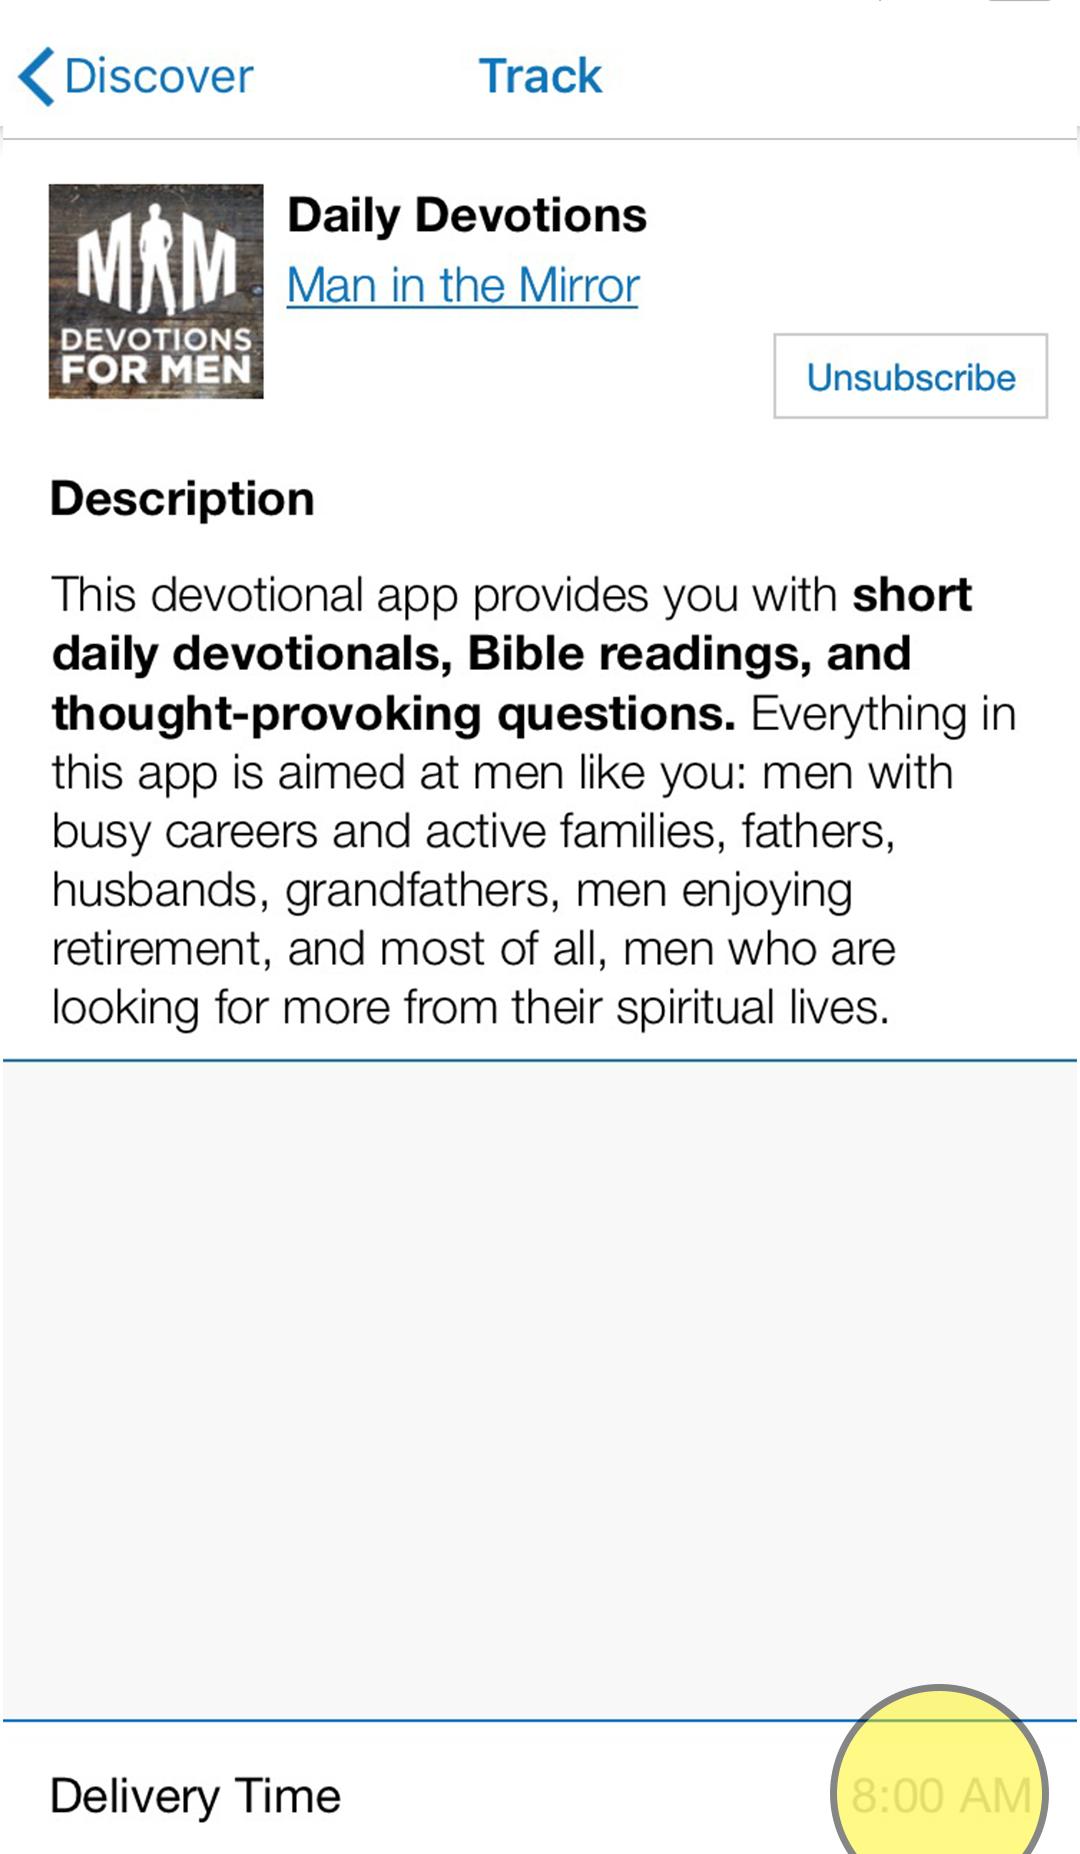 MIM Devotions for Men App - Man in the Mirror Resources